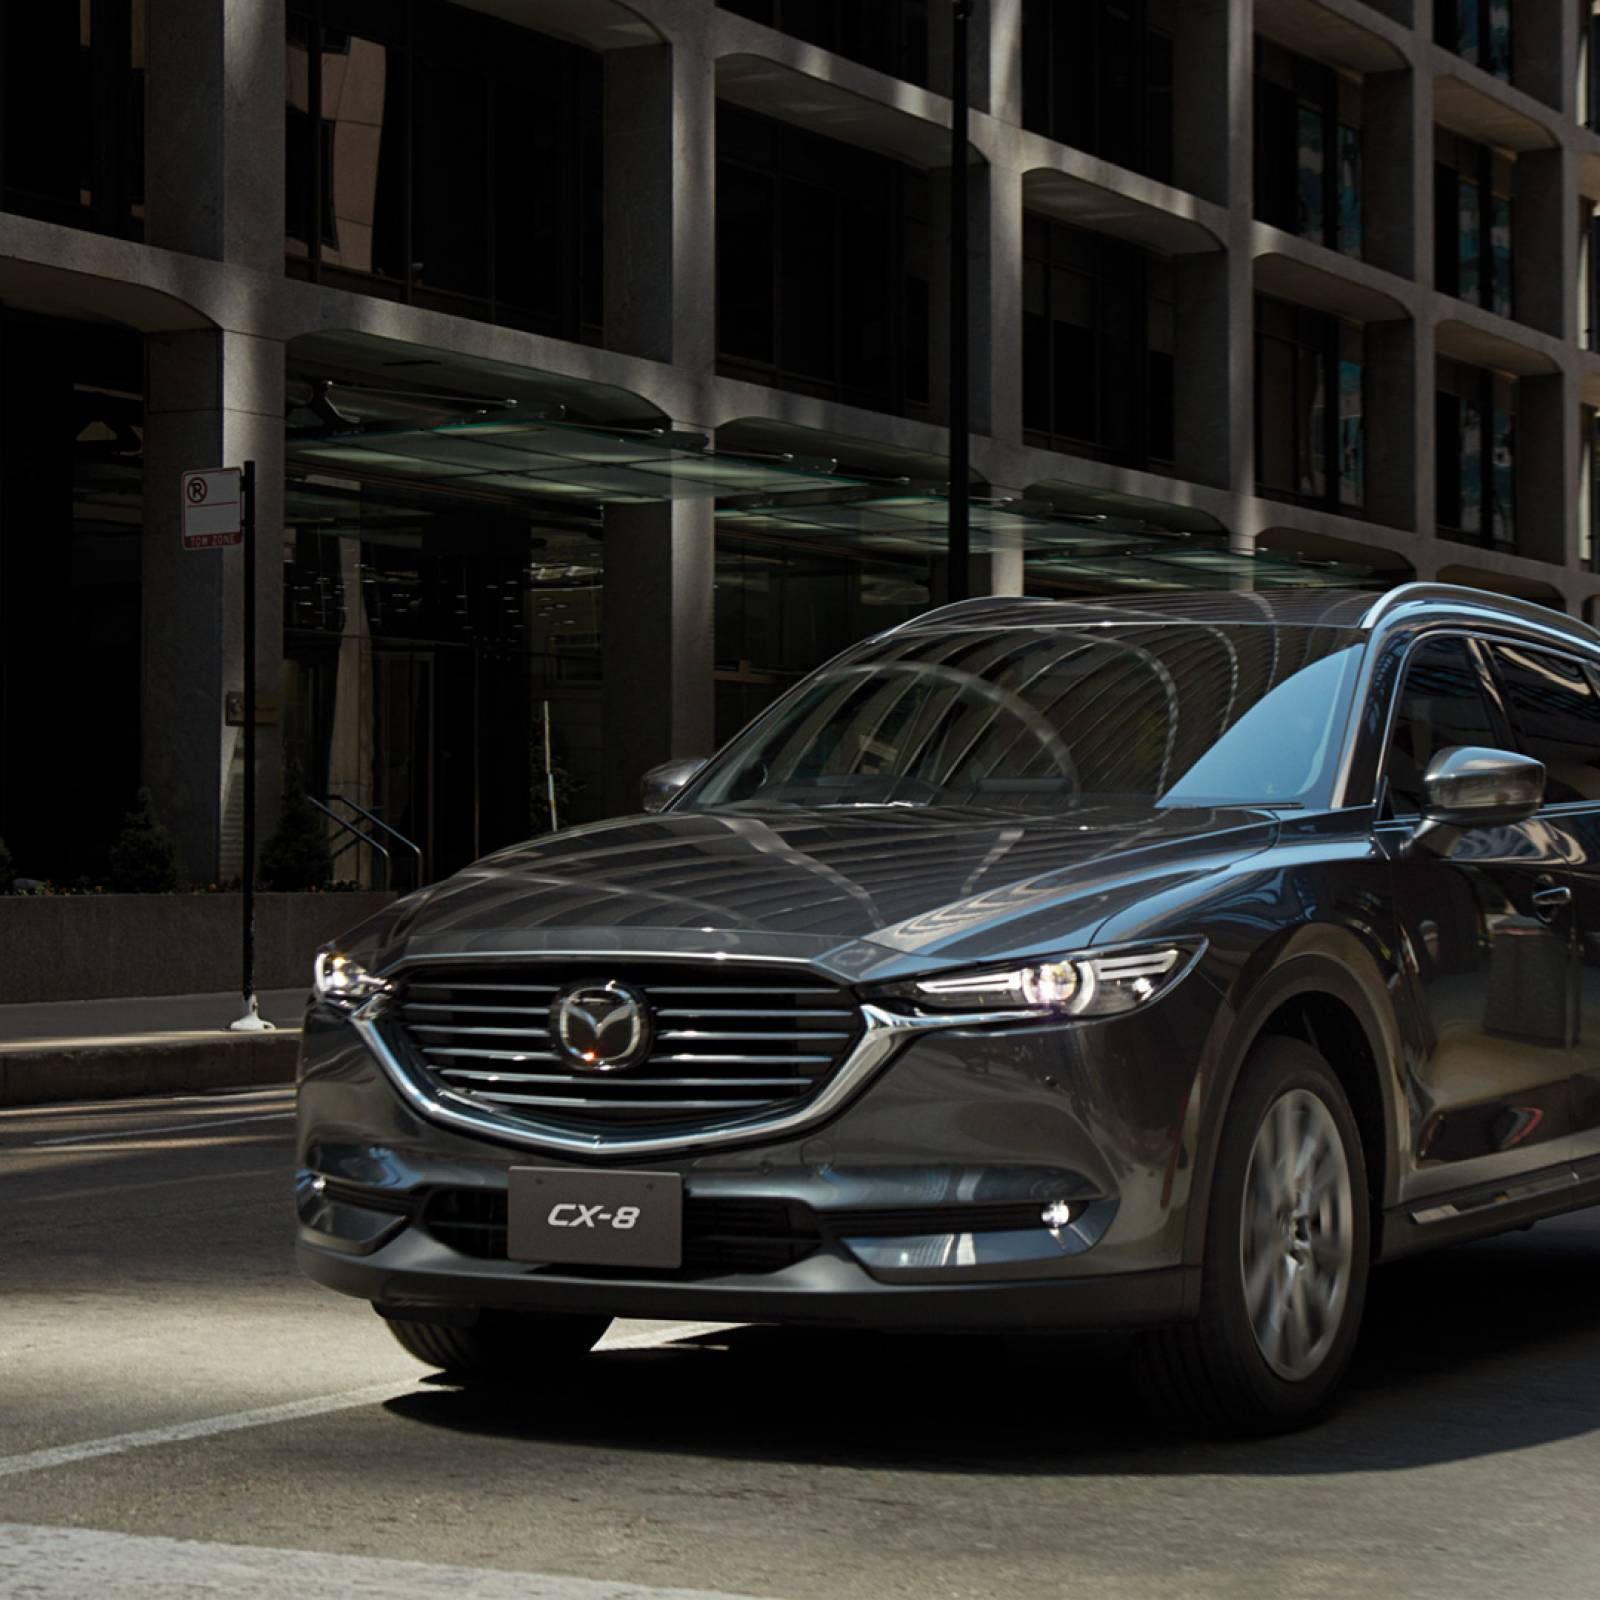 2020 Mazda CX-8 2.5G 2WD Mid